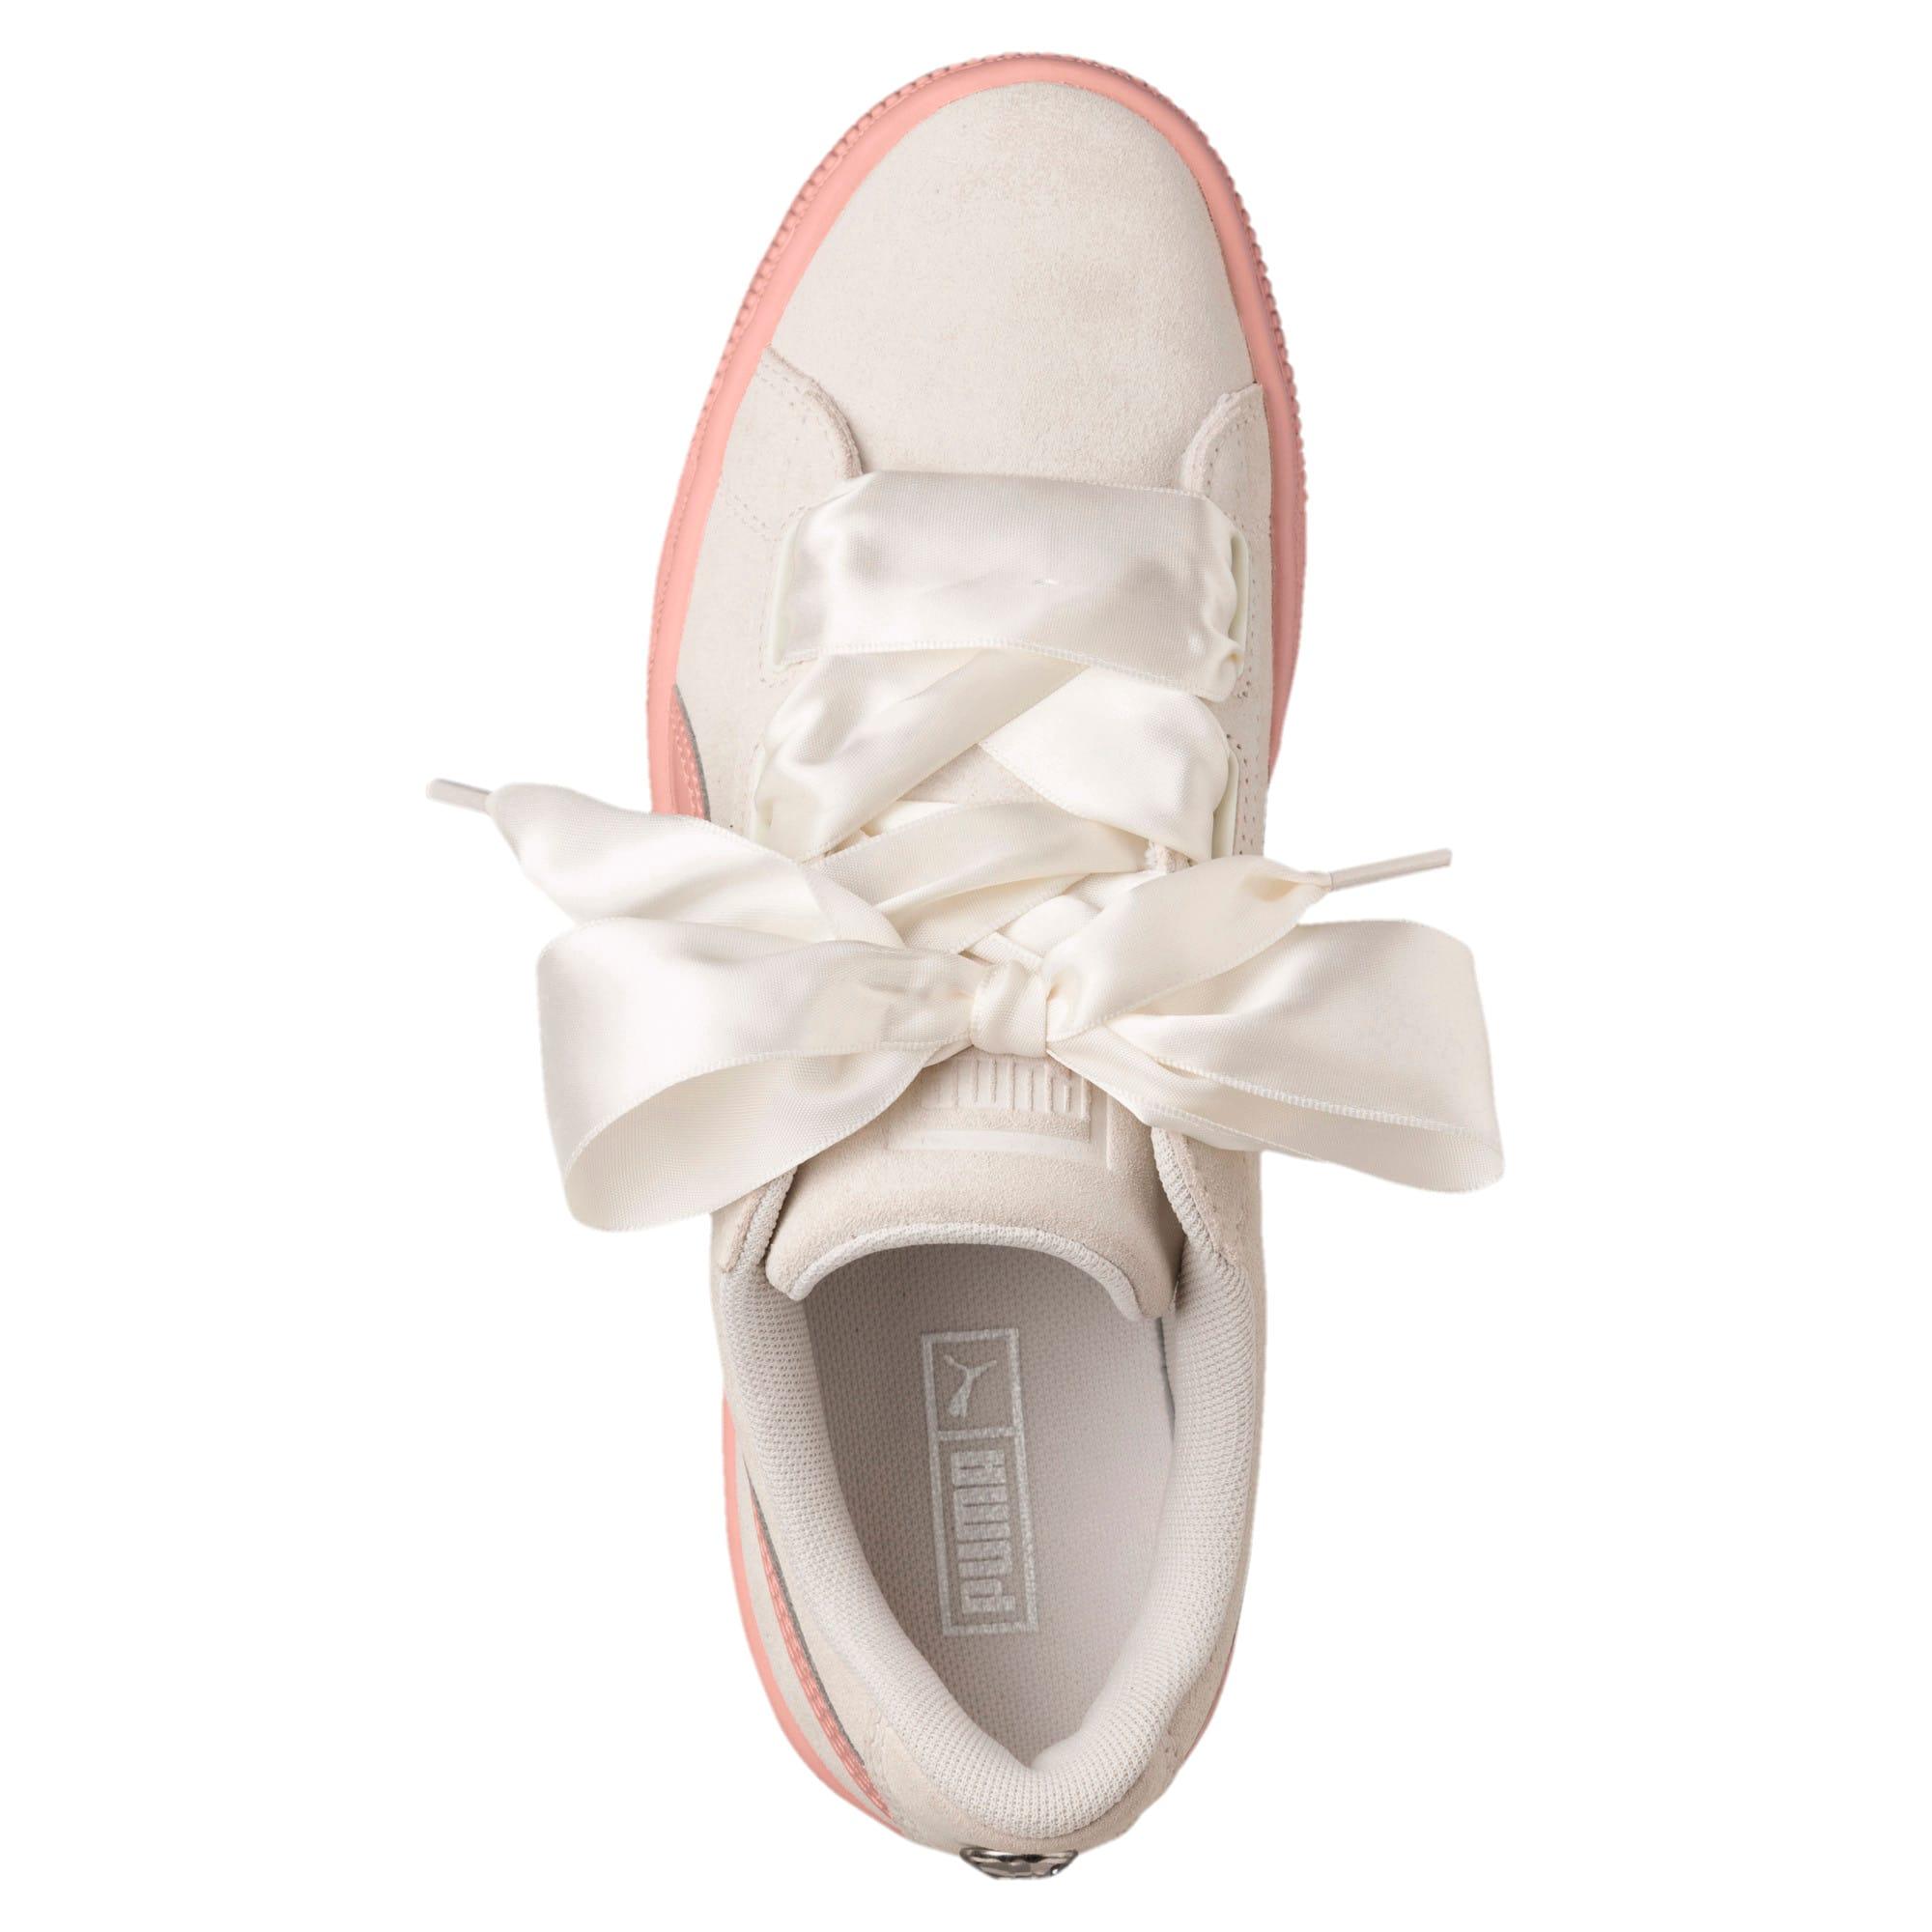 Thumbnail 5 of Suede Heart Jewel Sneakers JR, Whisper White-Peach Beige, medium